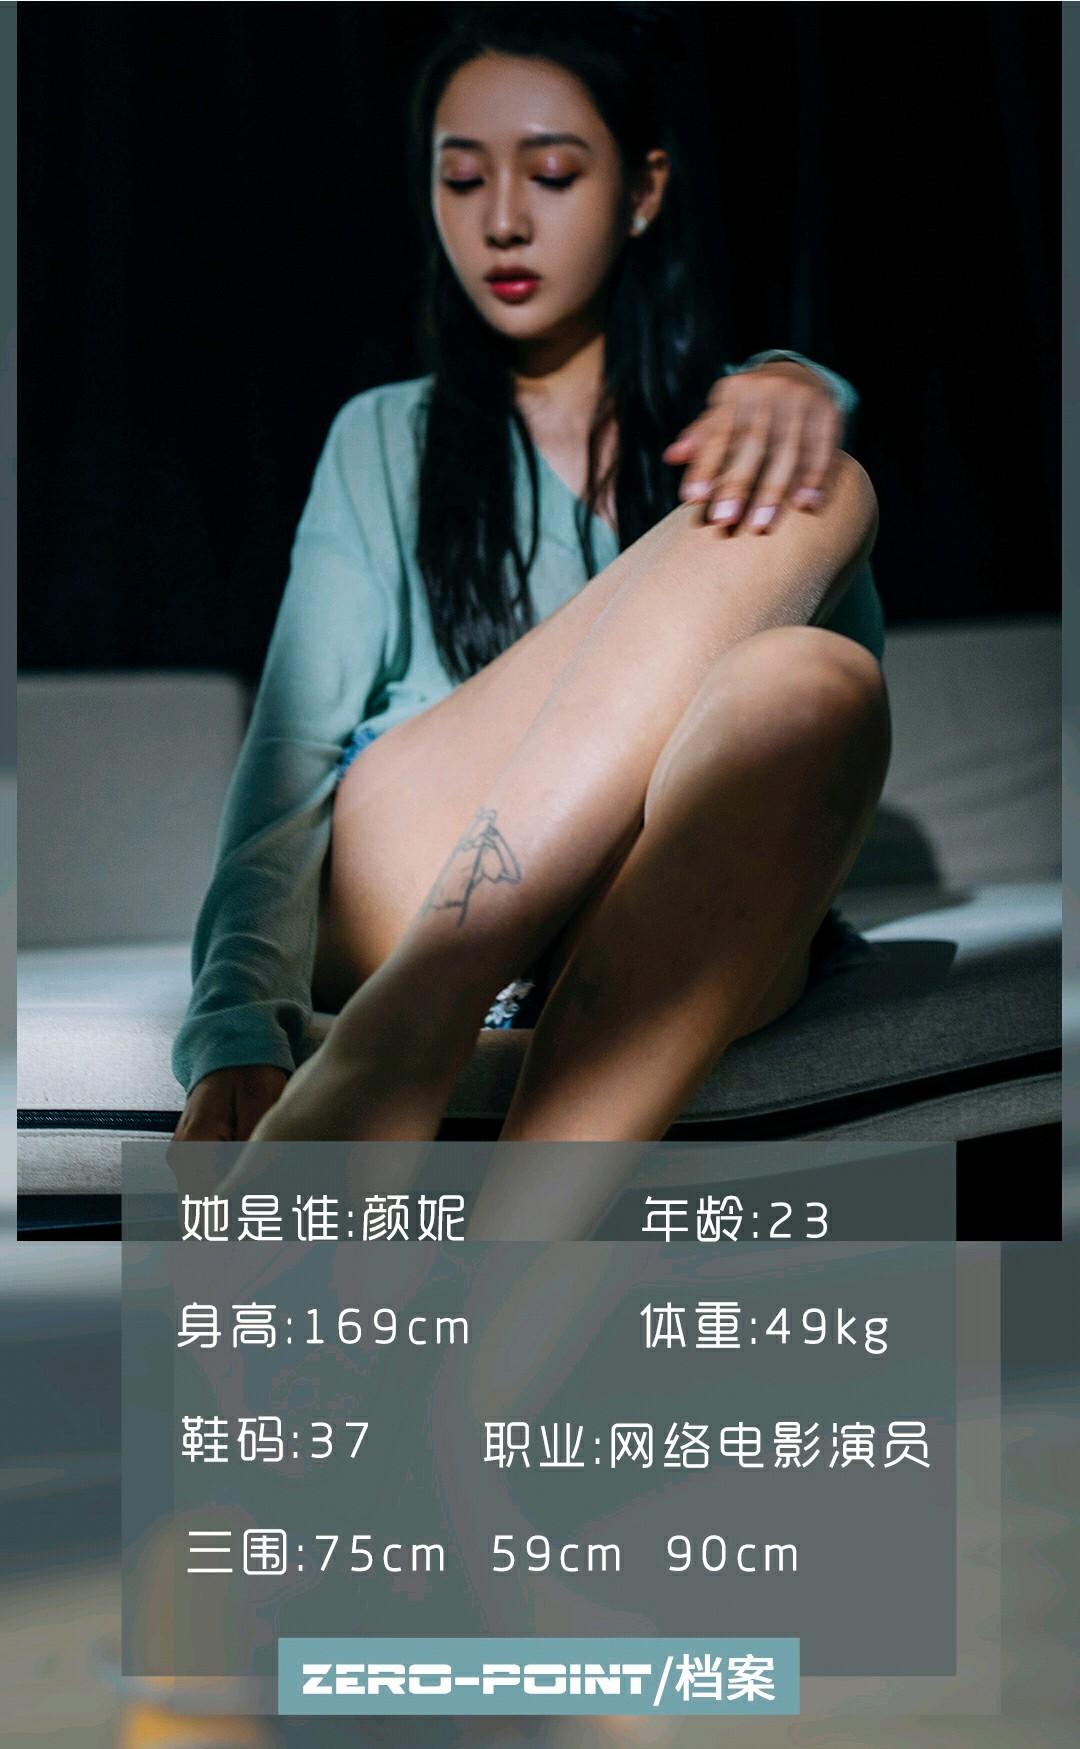 [LD零度摄影] 2020.09.04 No.075 颜妮 第1张